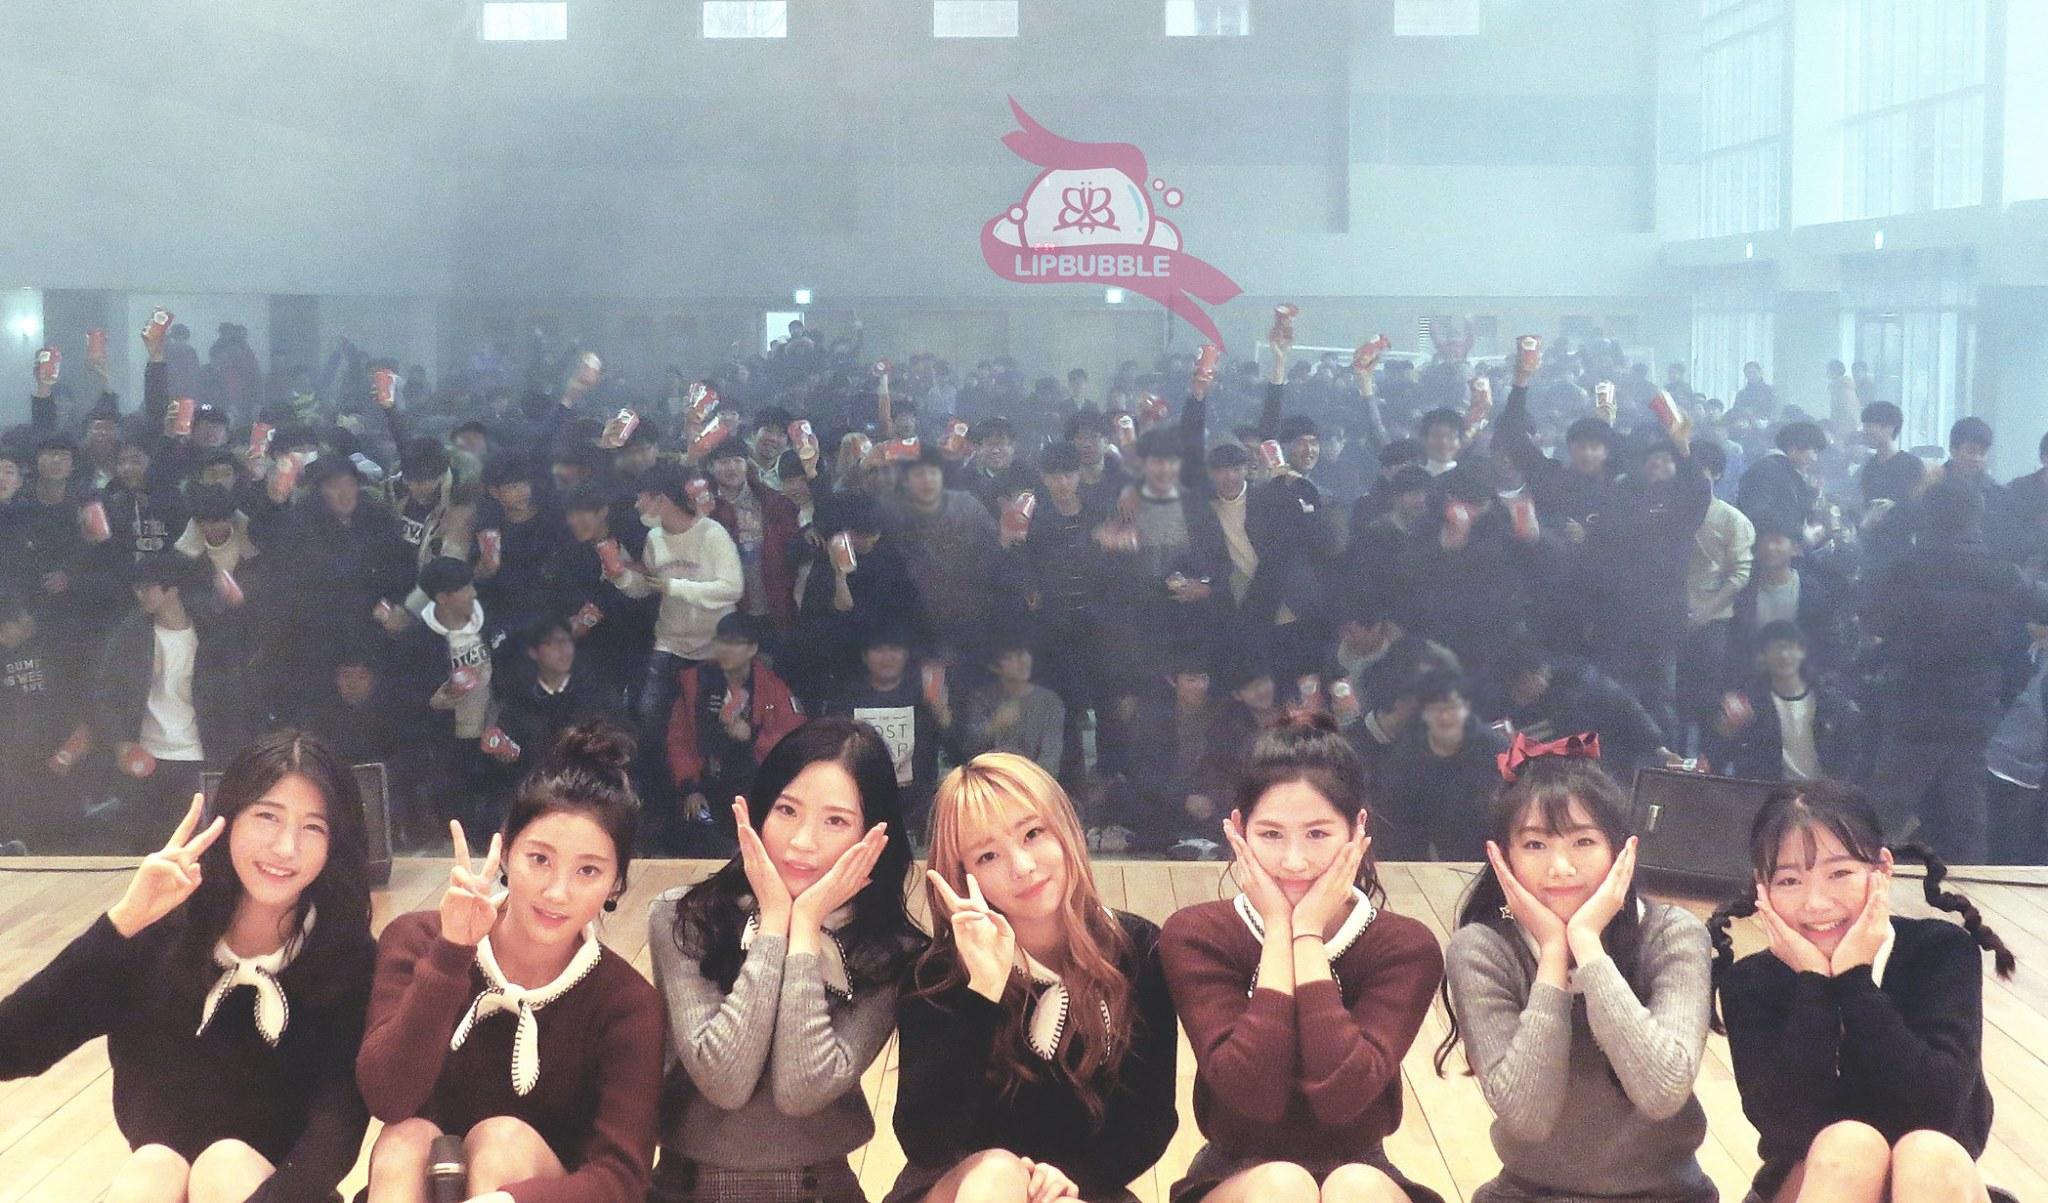 kpop, kpop 2017, kpop rookies 2017, kpop debut 2017, 2017 debut, 2017 kpop debut, lipbubble debut, lipbubble 2017, kpop lipbubble